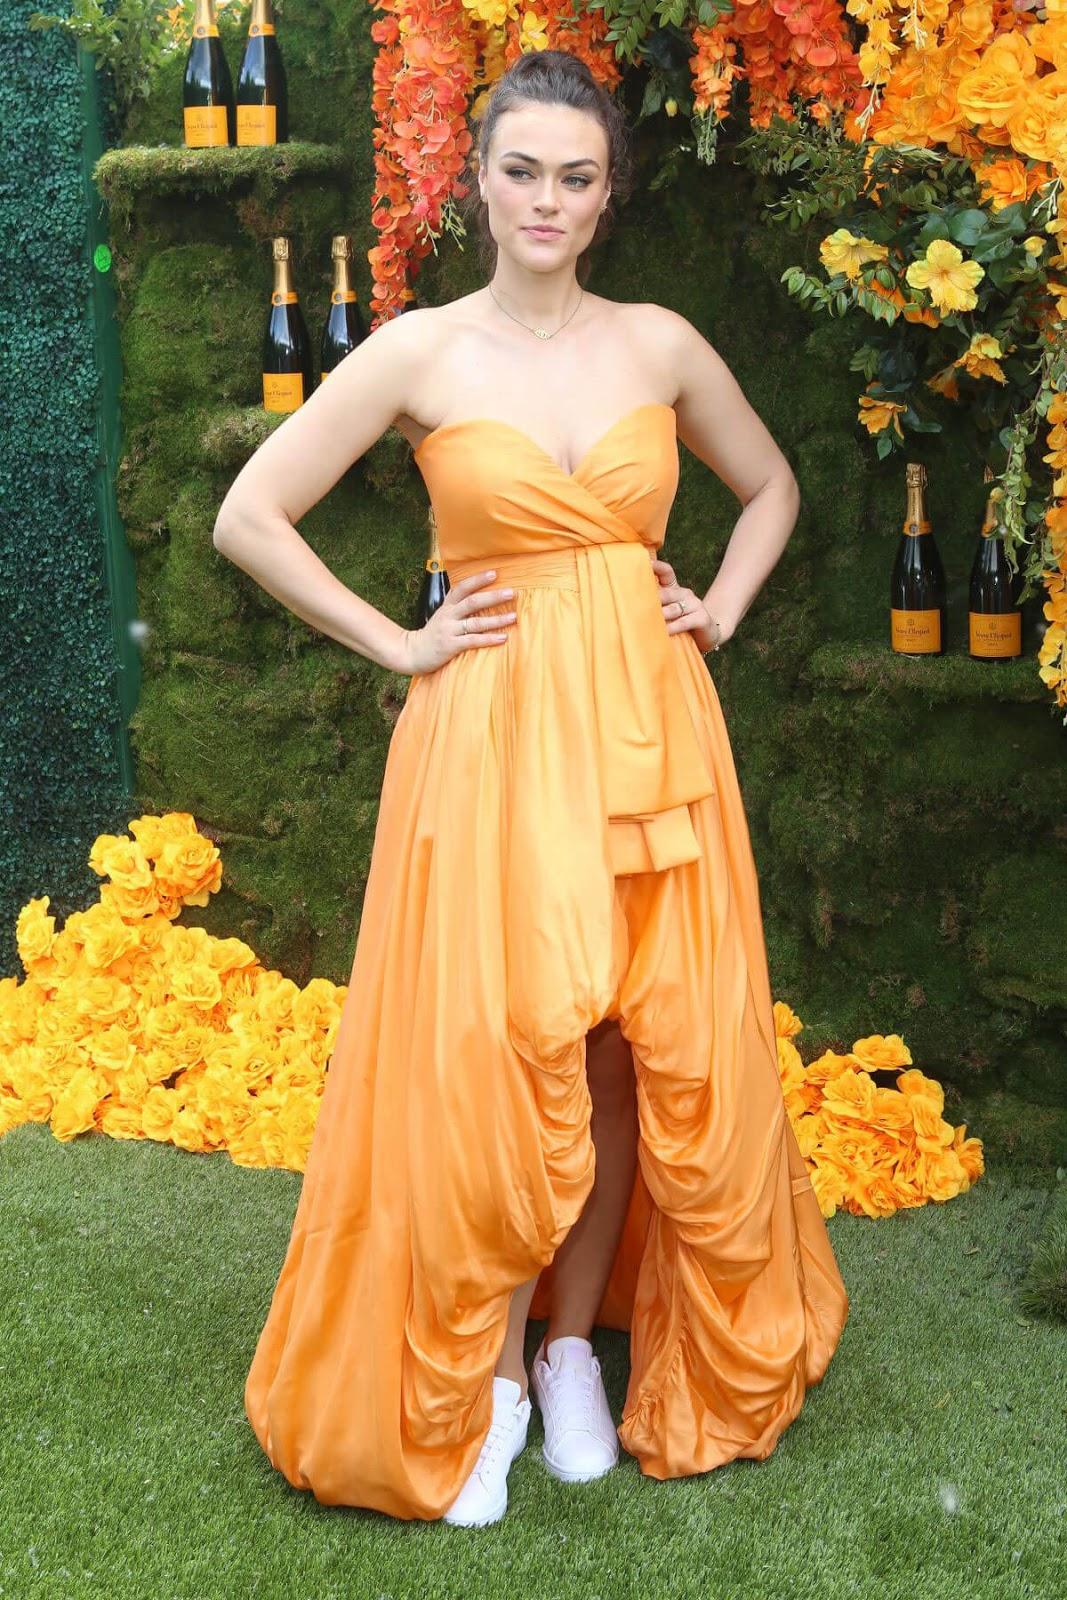 Calvin Klein's Plus-Size Model — Myla Dalbesio Is Size 10 ...